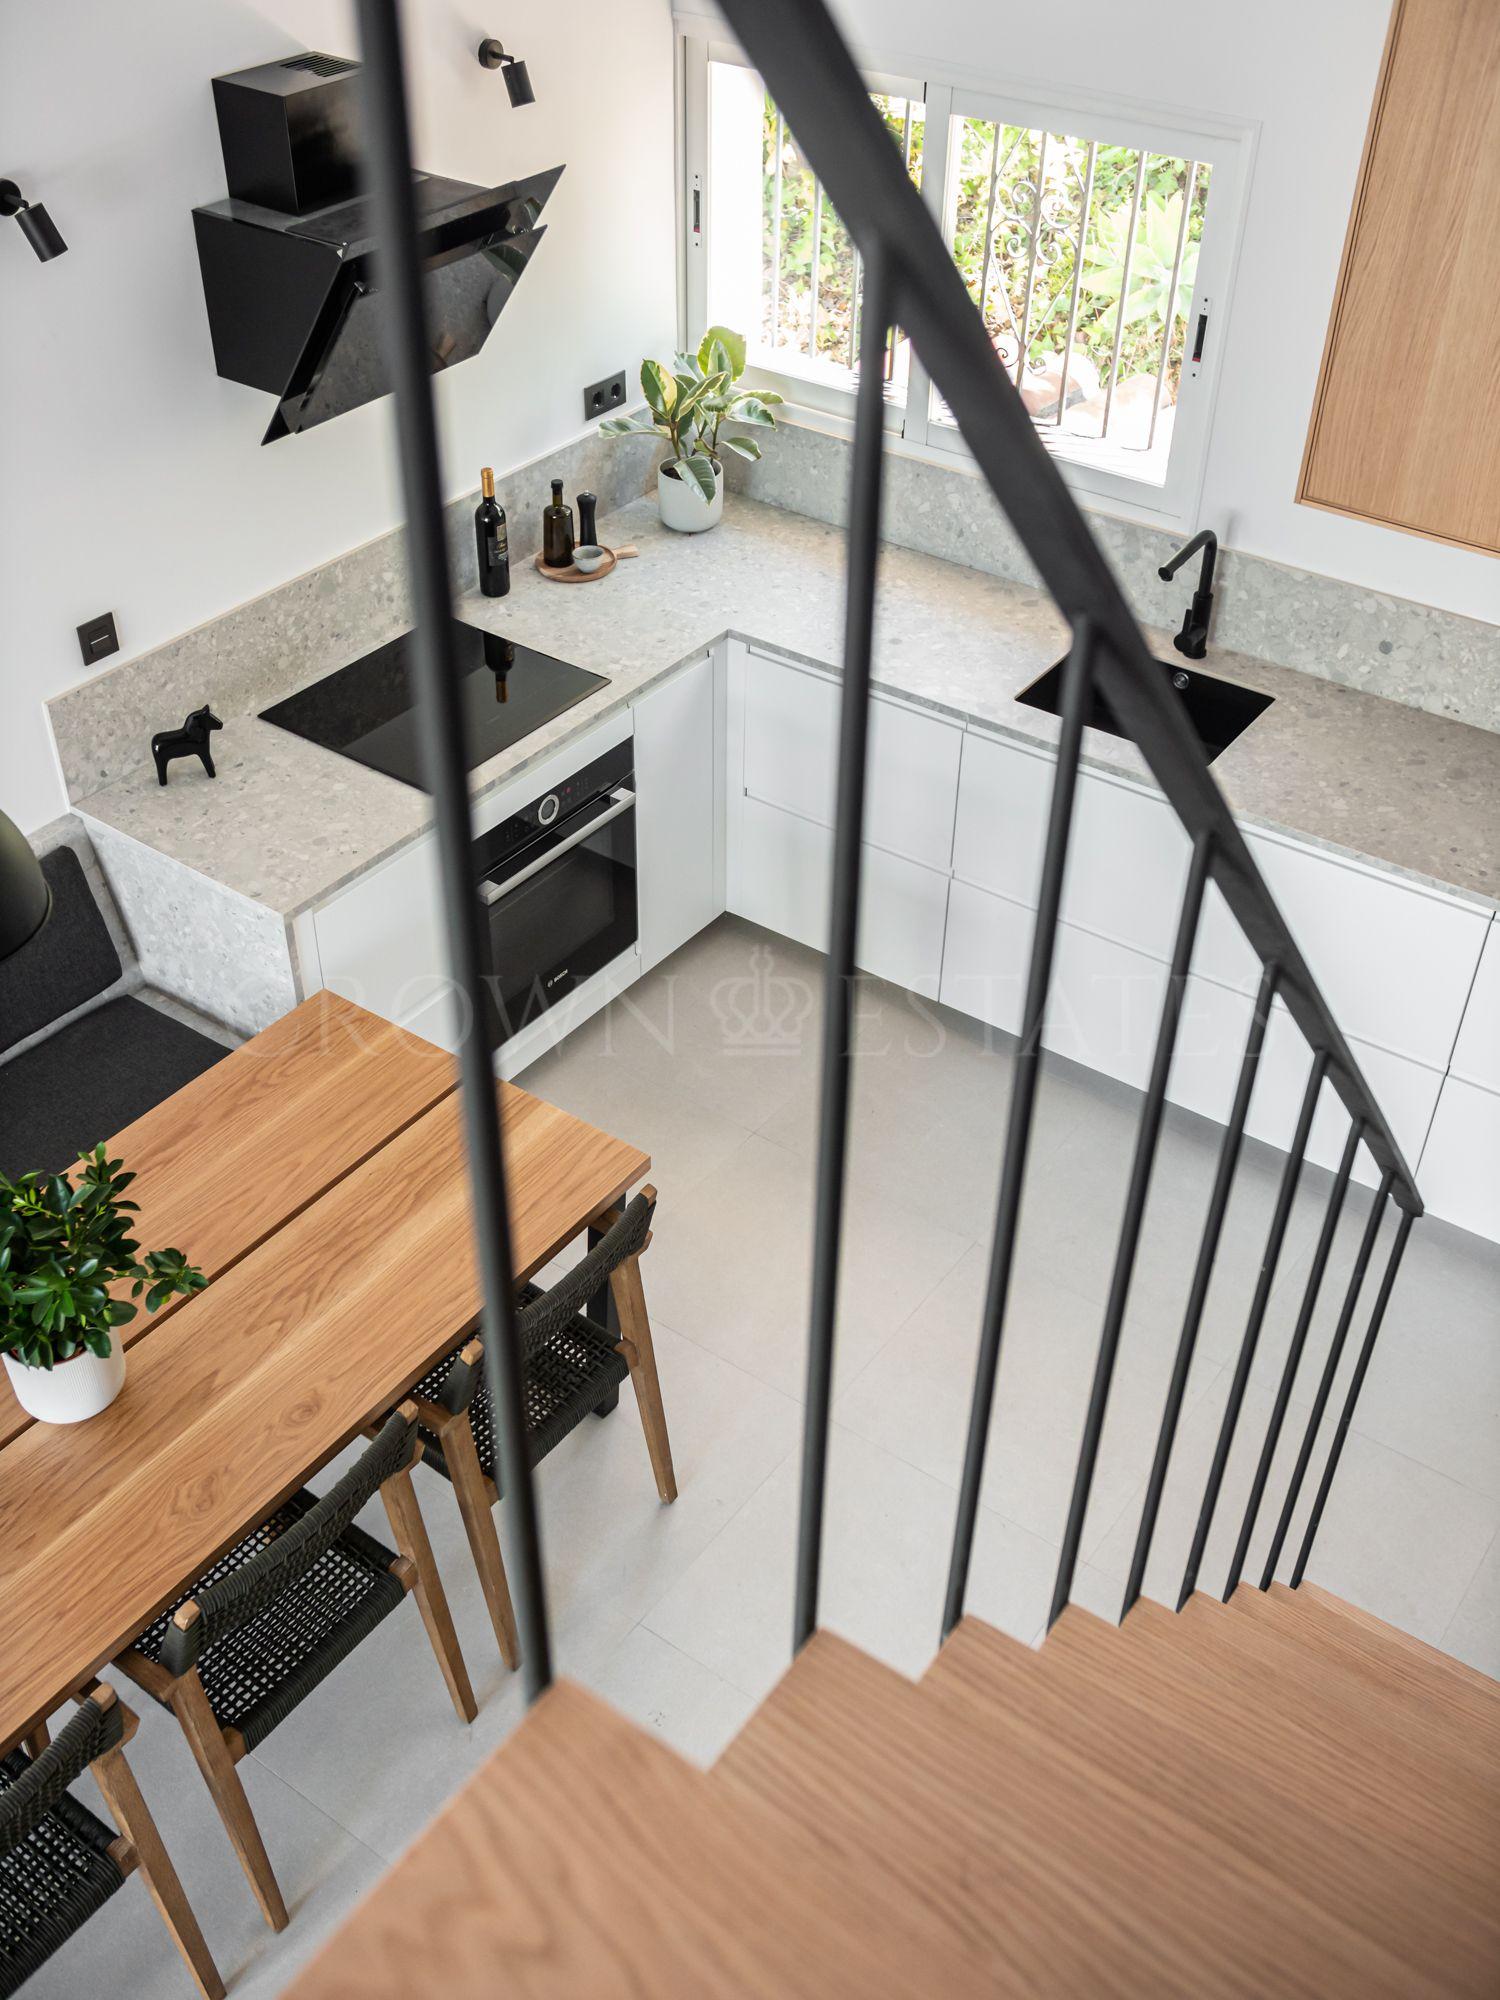 Incredible New Loft Apartment at Nueva Andalucia!